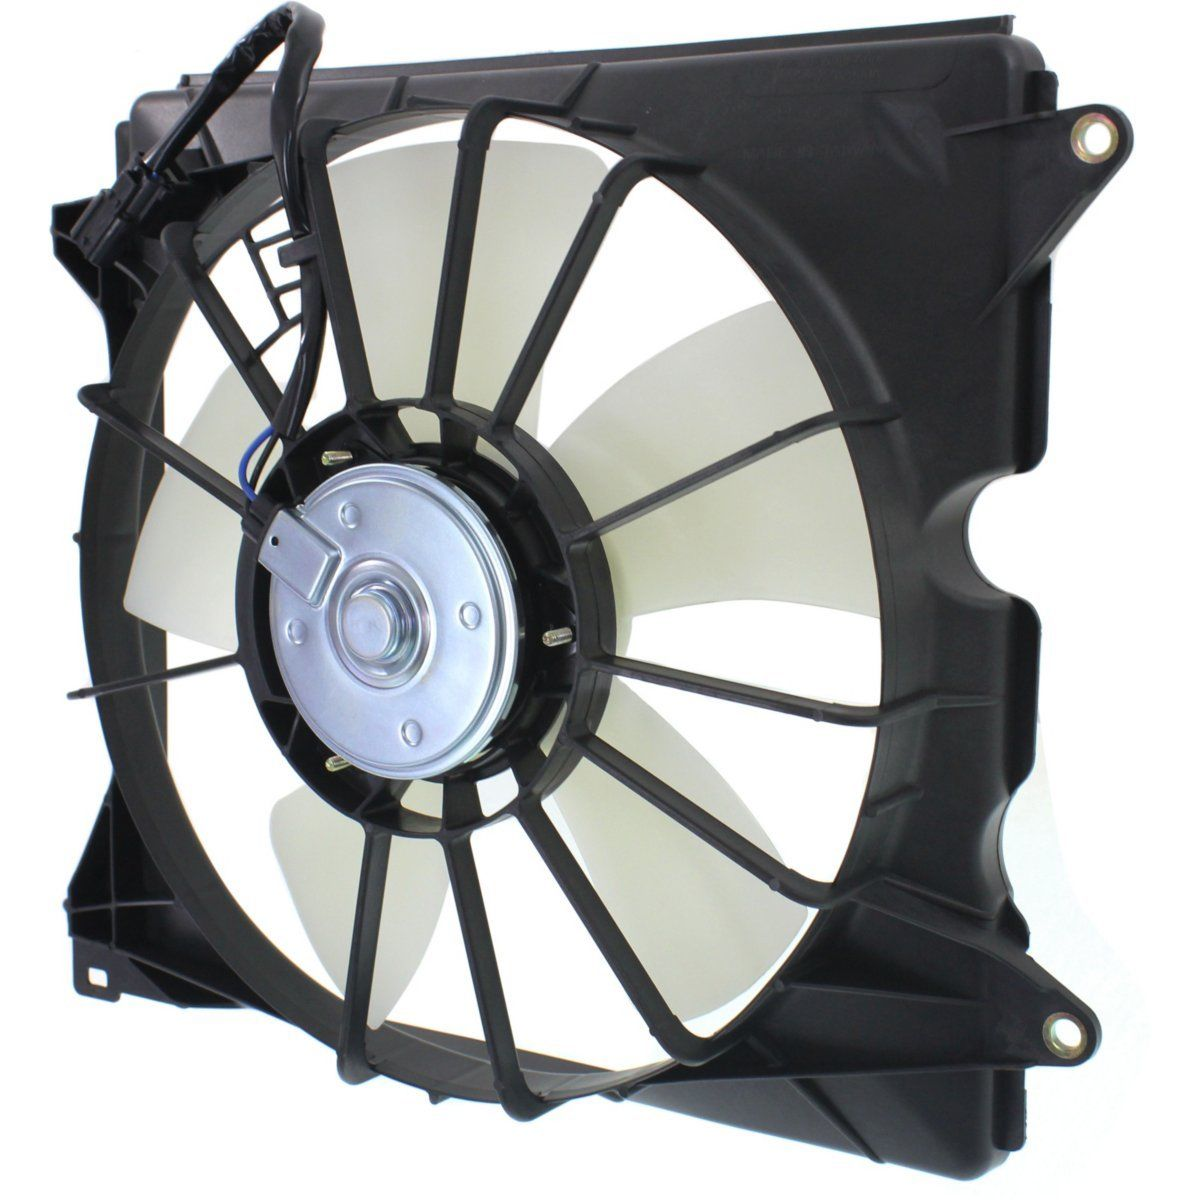 Left Side Denso Radiator Cooling Fan 2.4L, 4 Cylinder for 13-17 Honda Accord